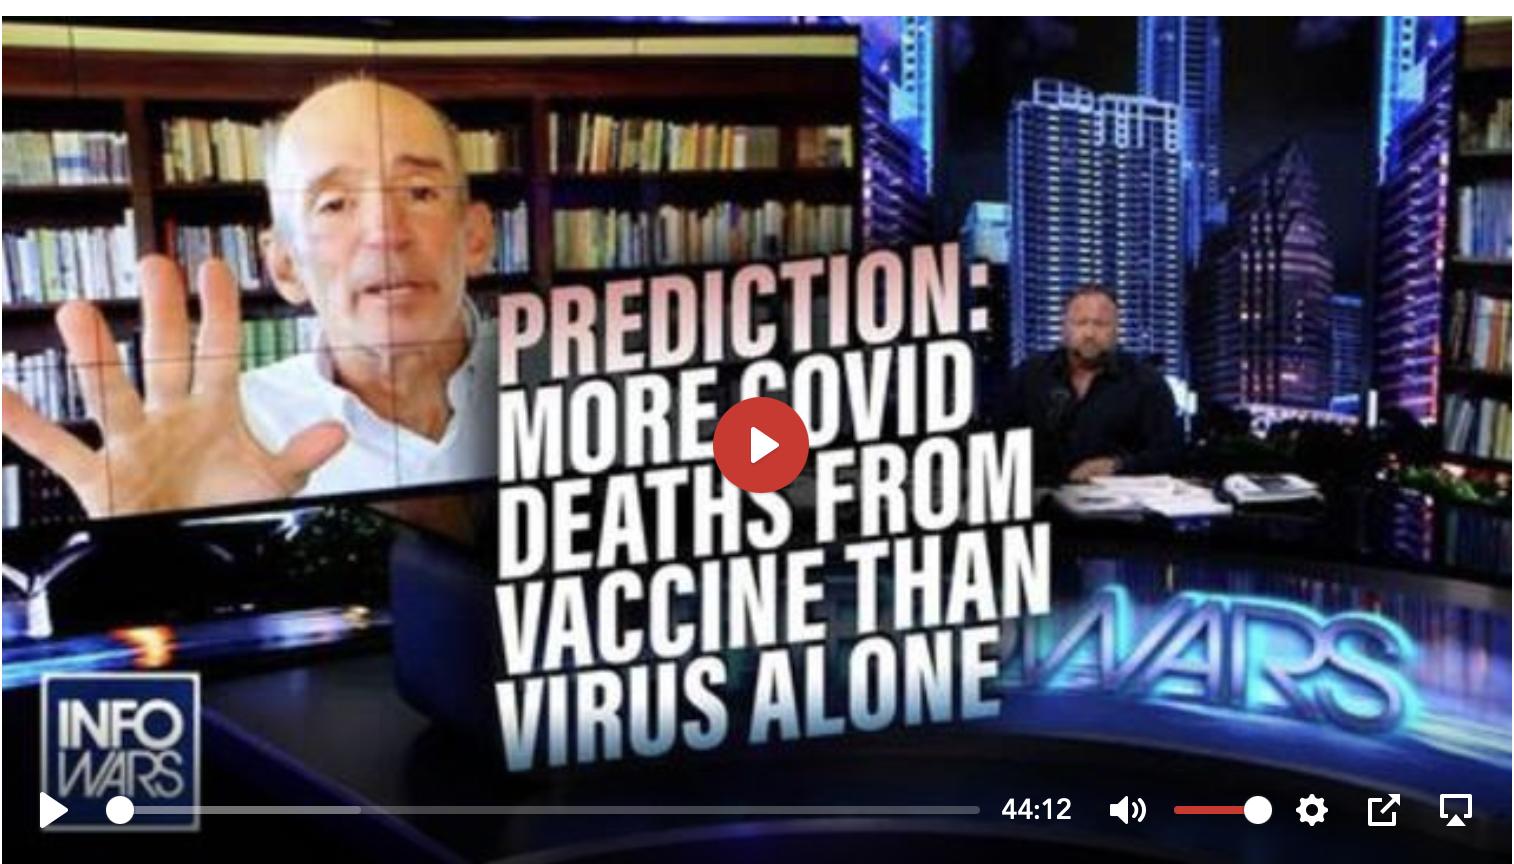 Depopulation & The mRNA Vaccine Screen-Shot-2021-05-27-at-19.41.07